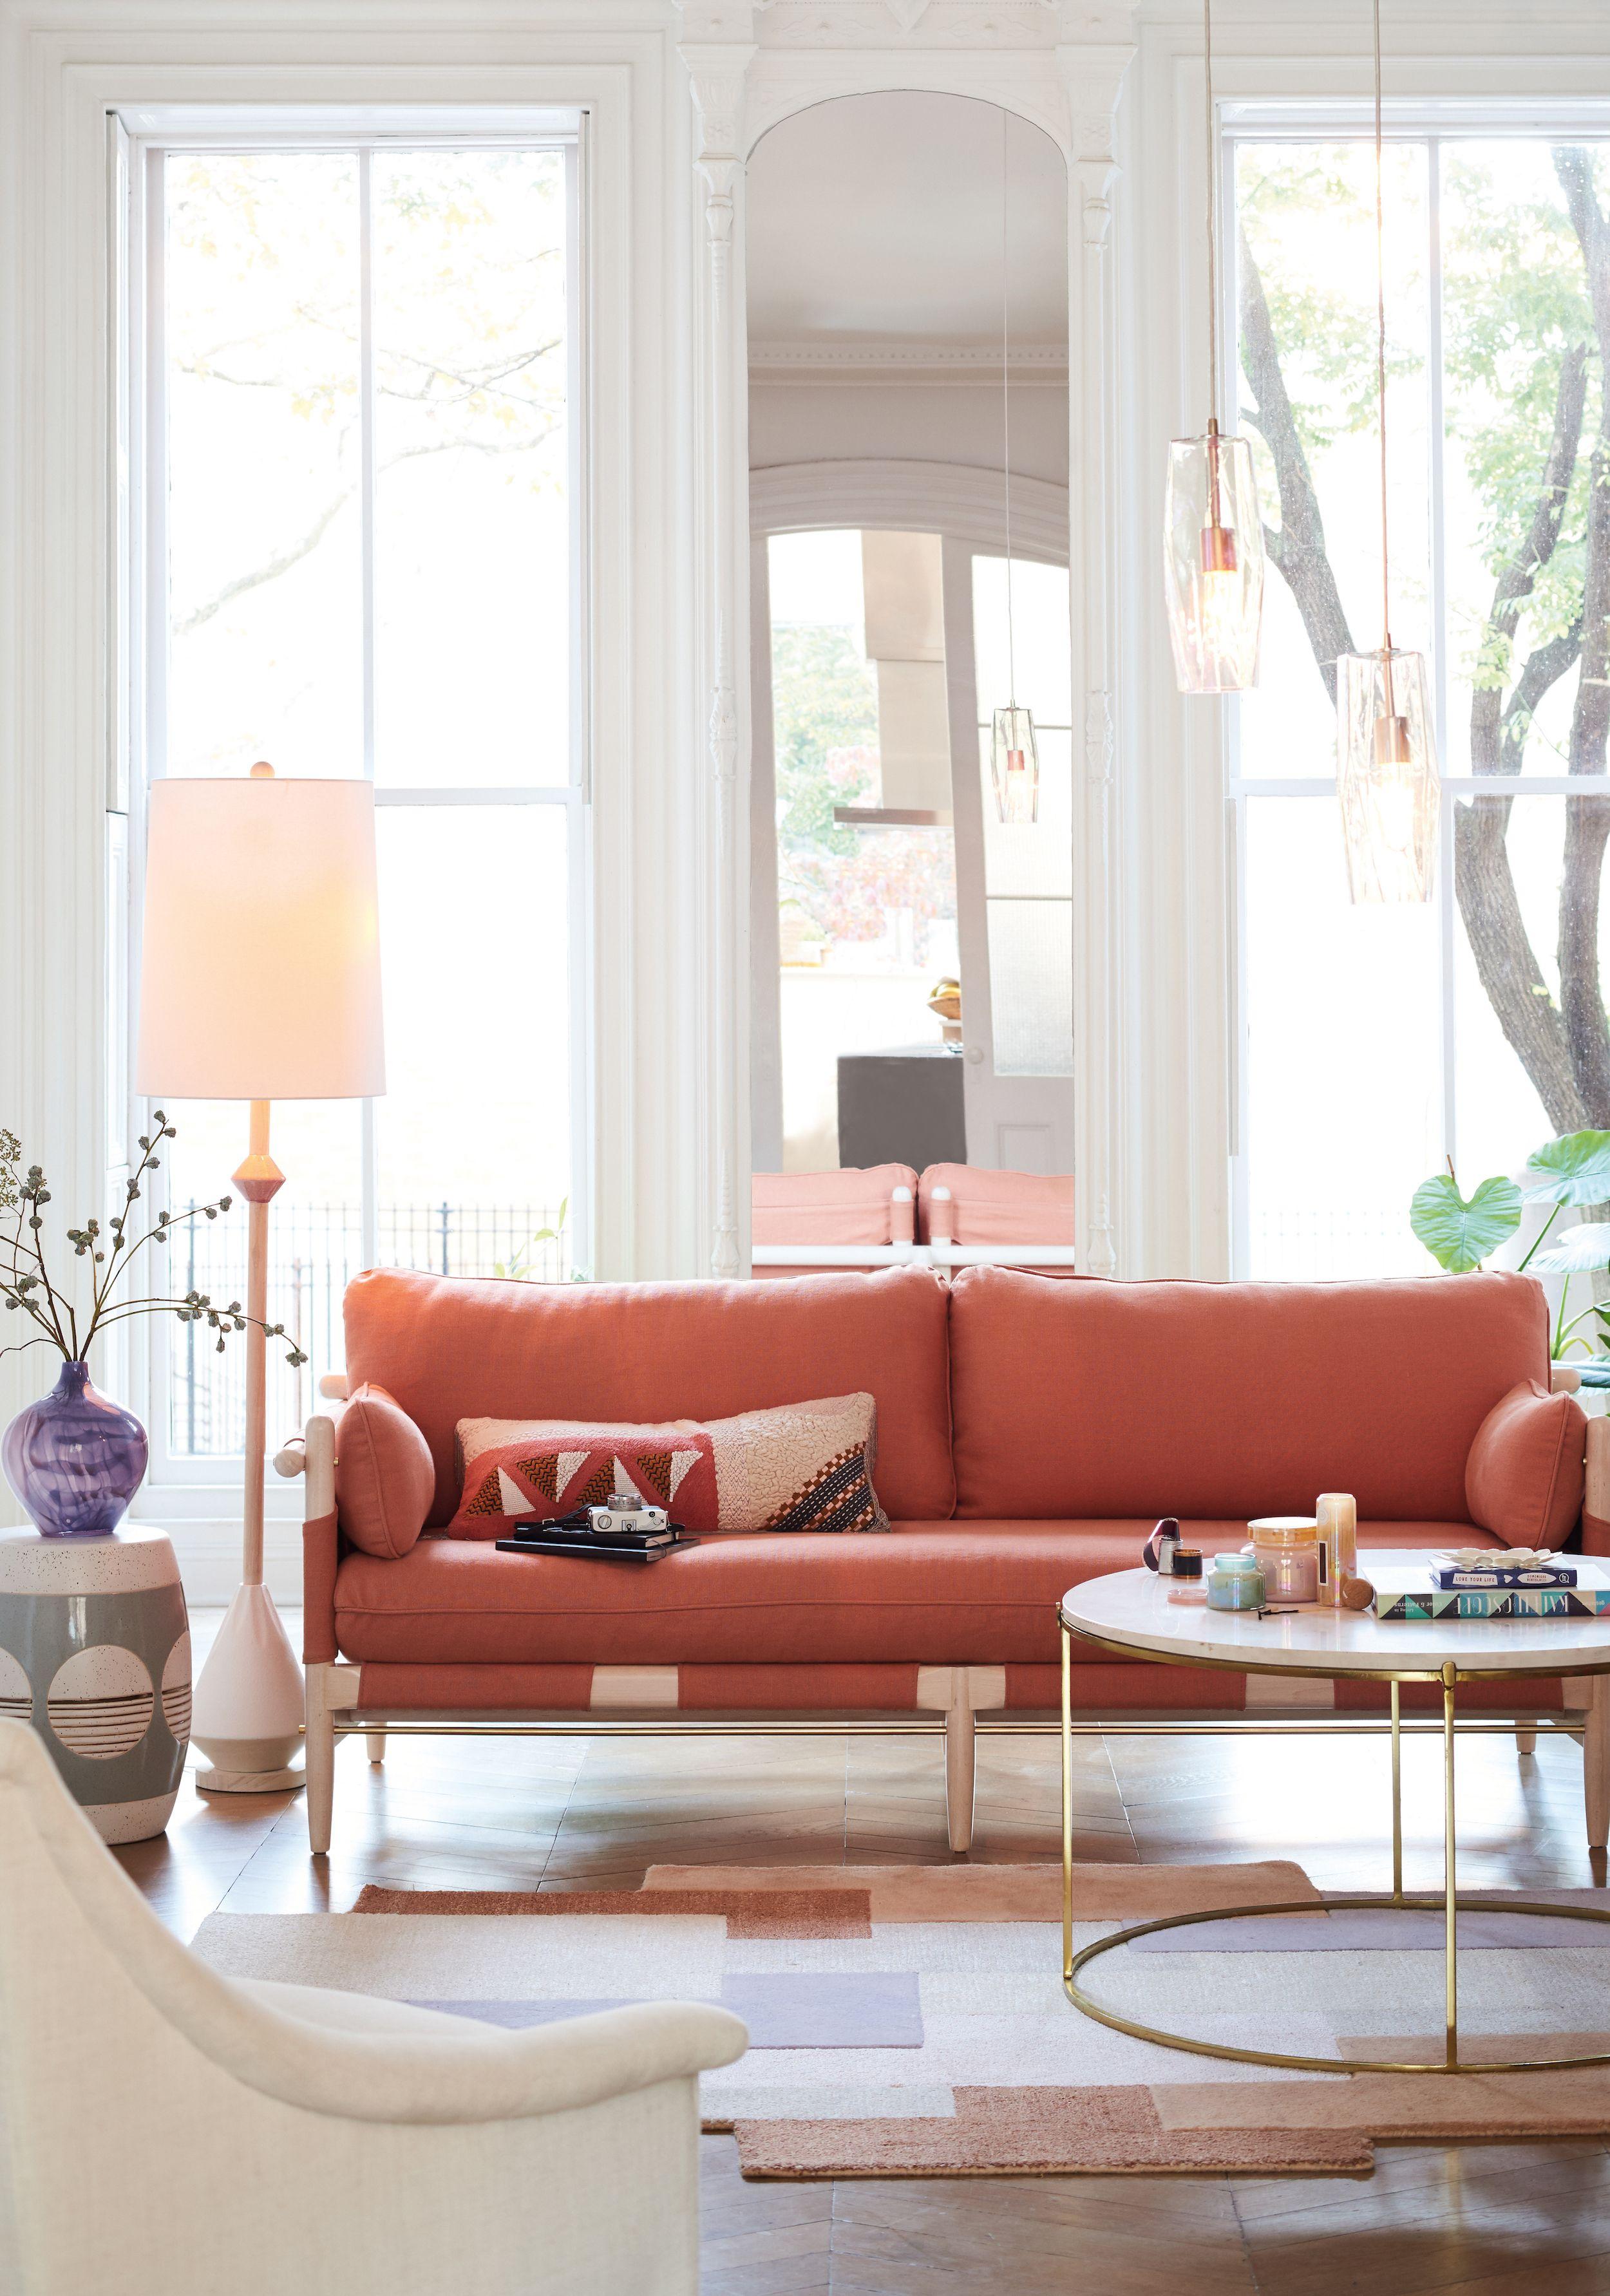 Belgian Linen Jamaica Sofa Trending Decor Home Decor Tr